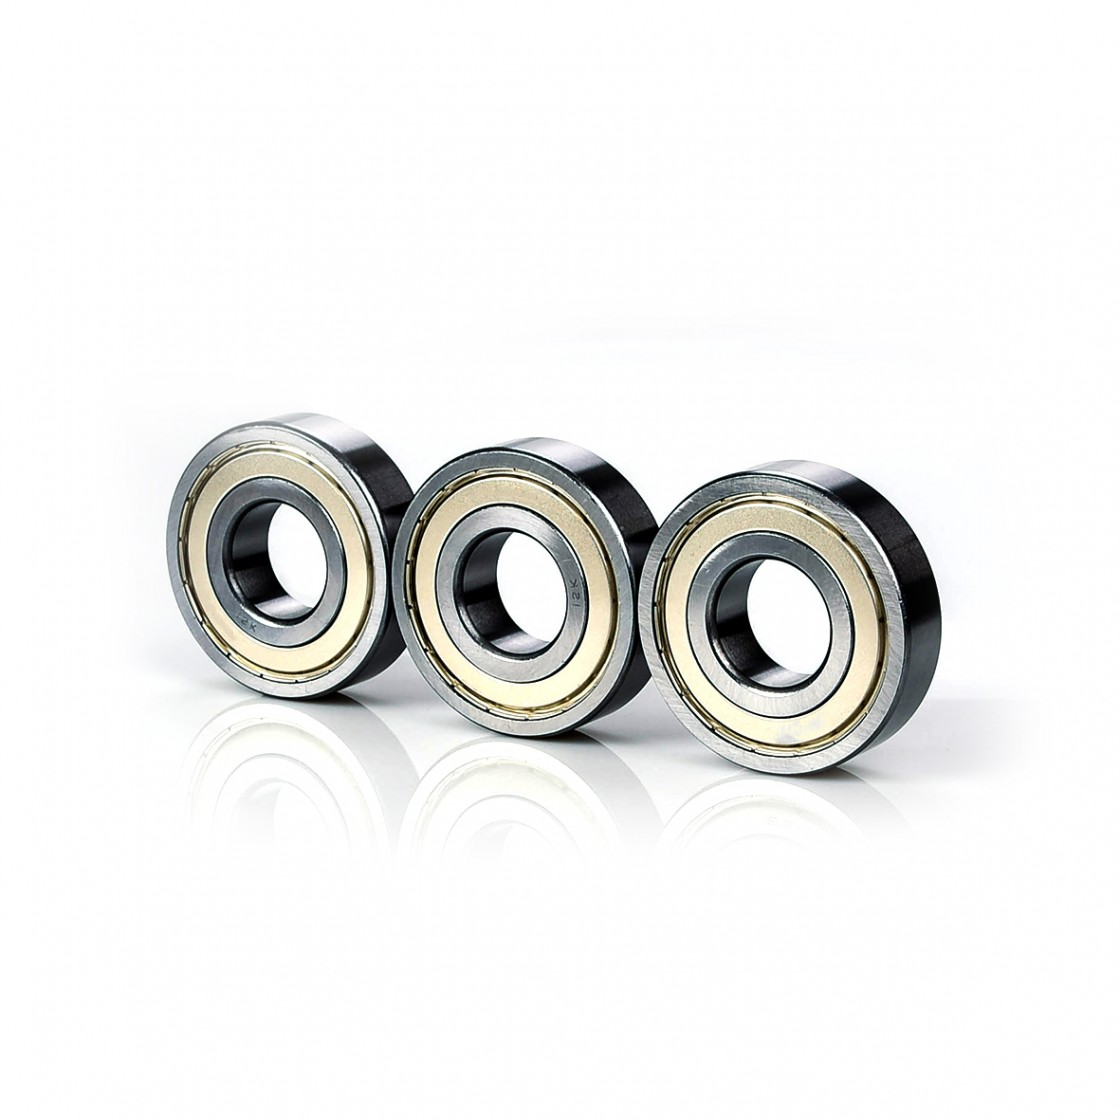 61900/62900/61901/61902/61903/61904/61905/61906/61907/61908/61909/61910/61911/61912/61913/61914/61915/Z/2z/RS/2RS/N/2RS1/Nr/Zn/Znr Deep Groove Ball Bearings